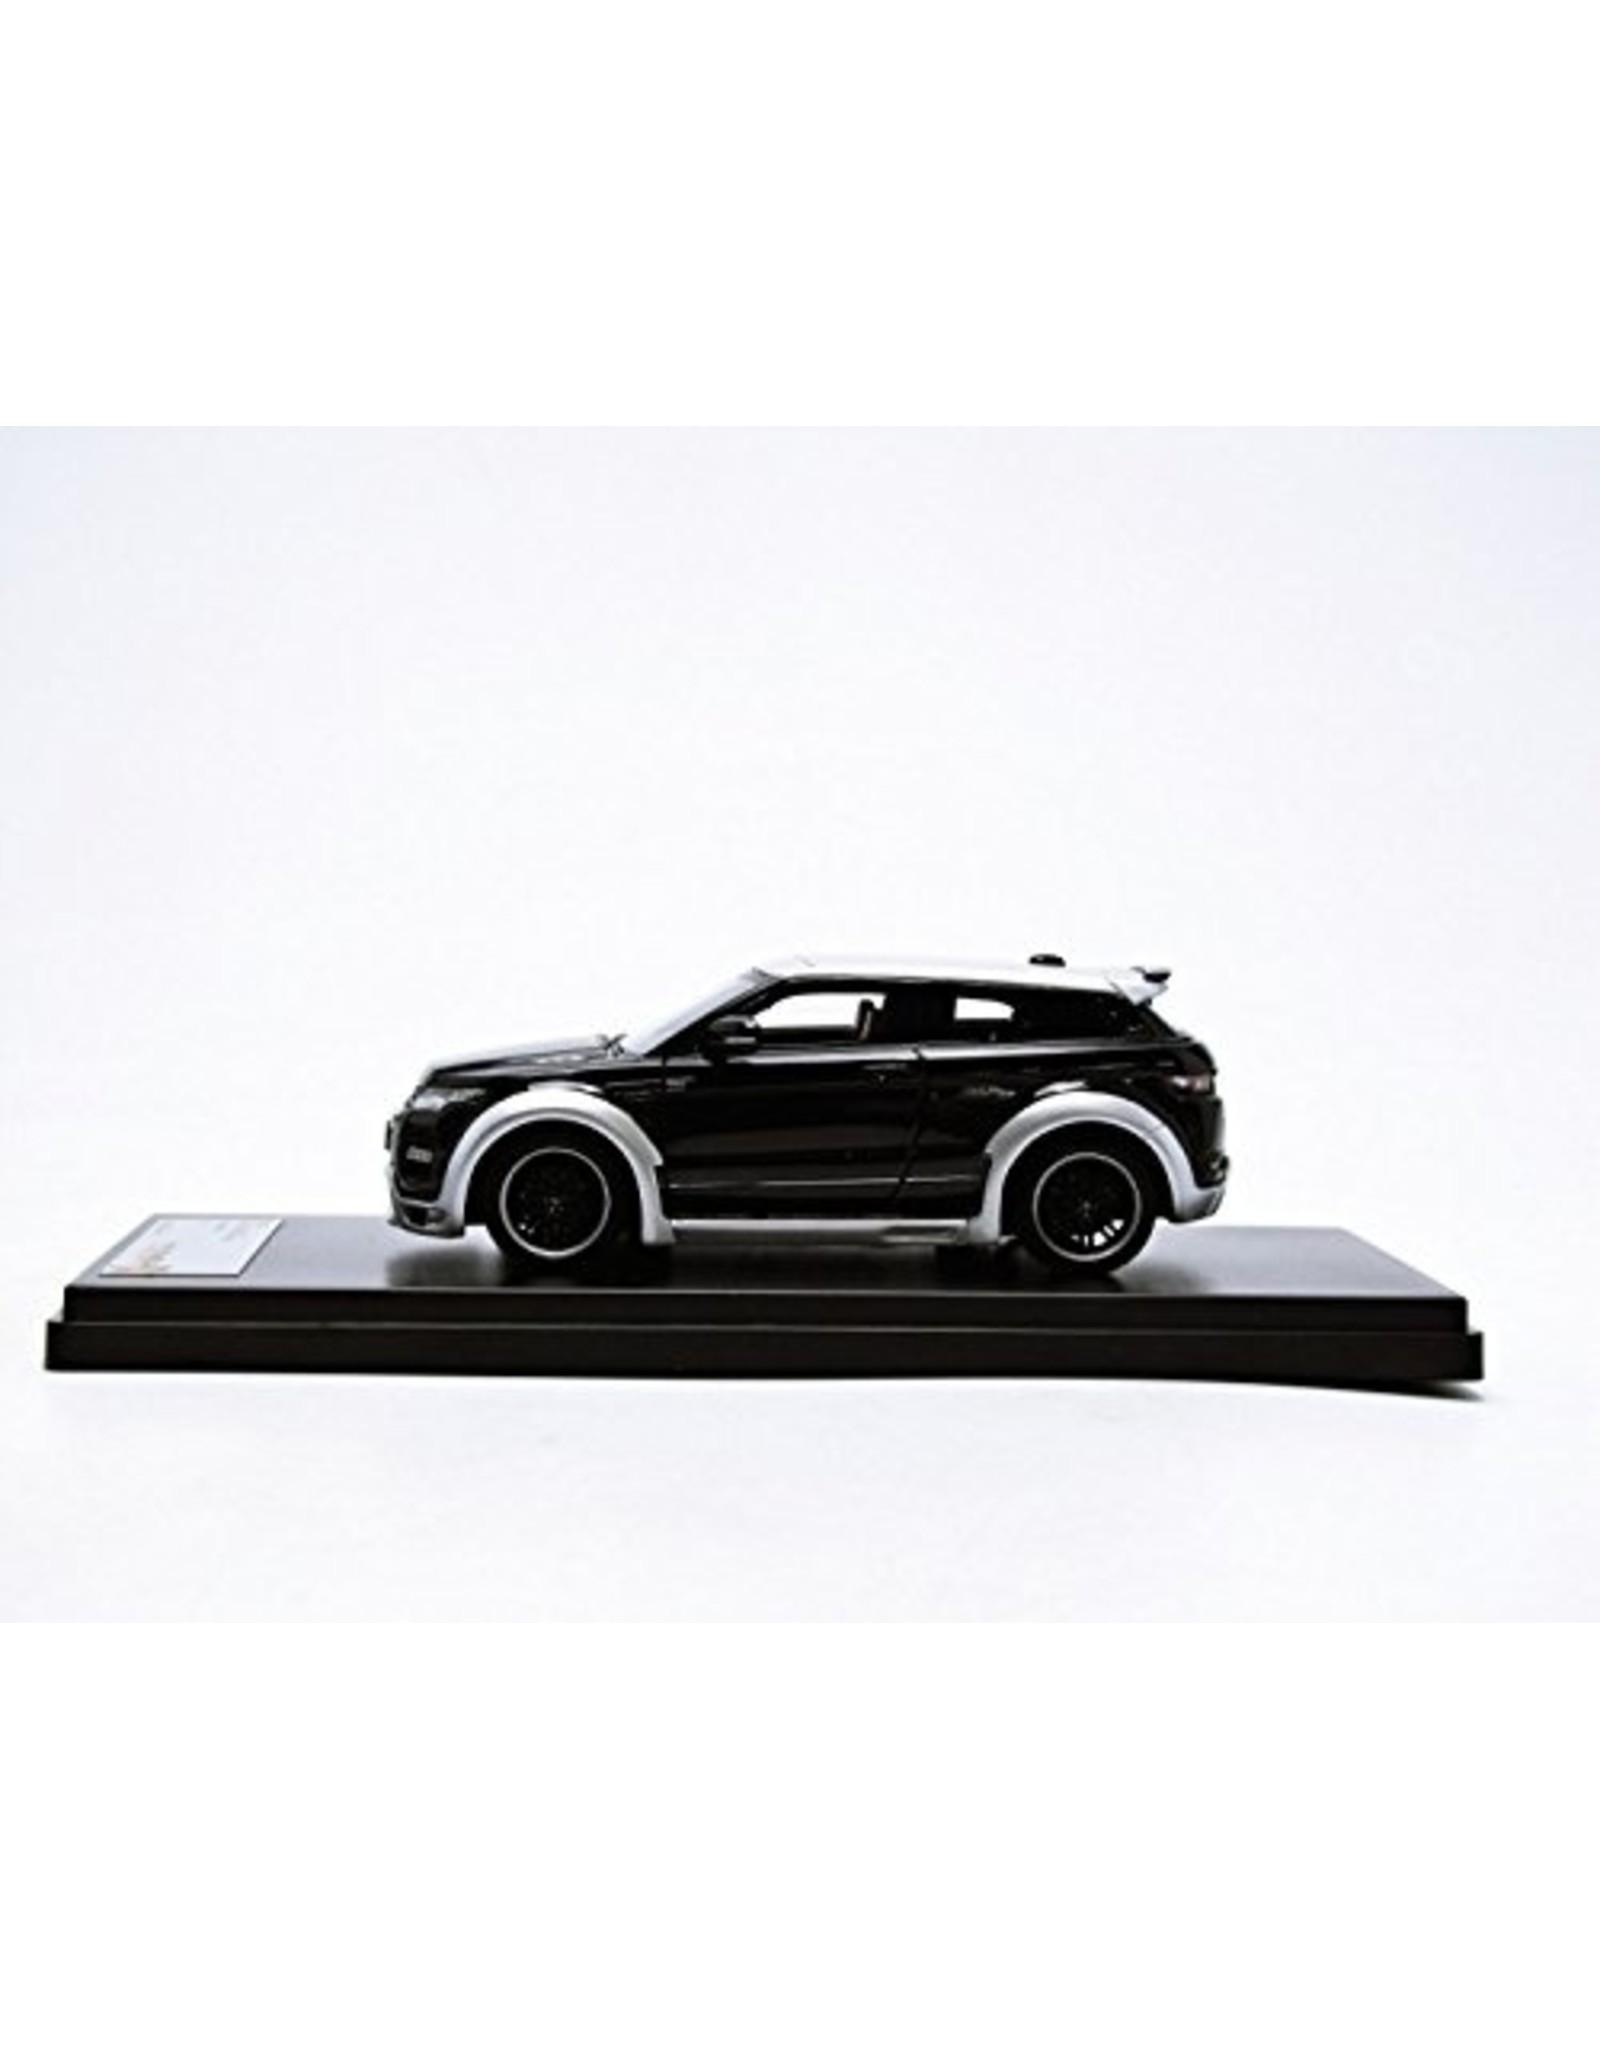 Land Rover Land Rover Range Rover Evoque By 'Hamann' 2012 - 1:43 - PremiumX - Models